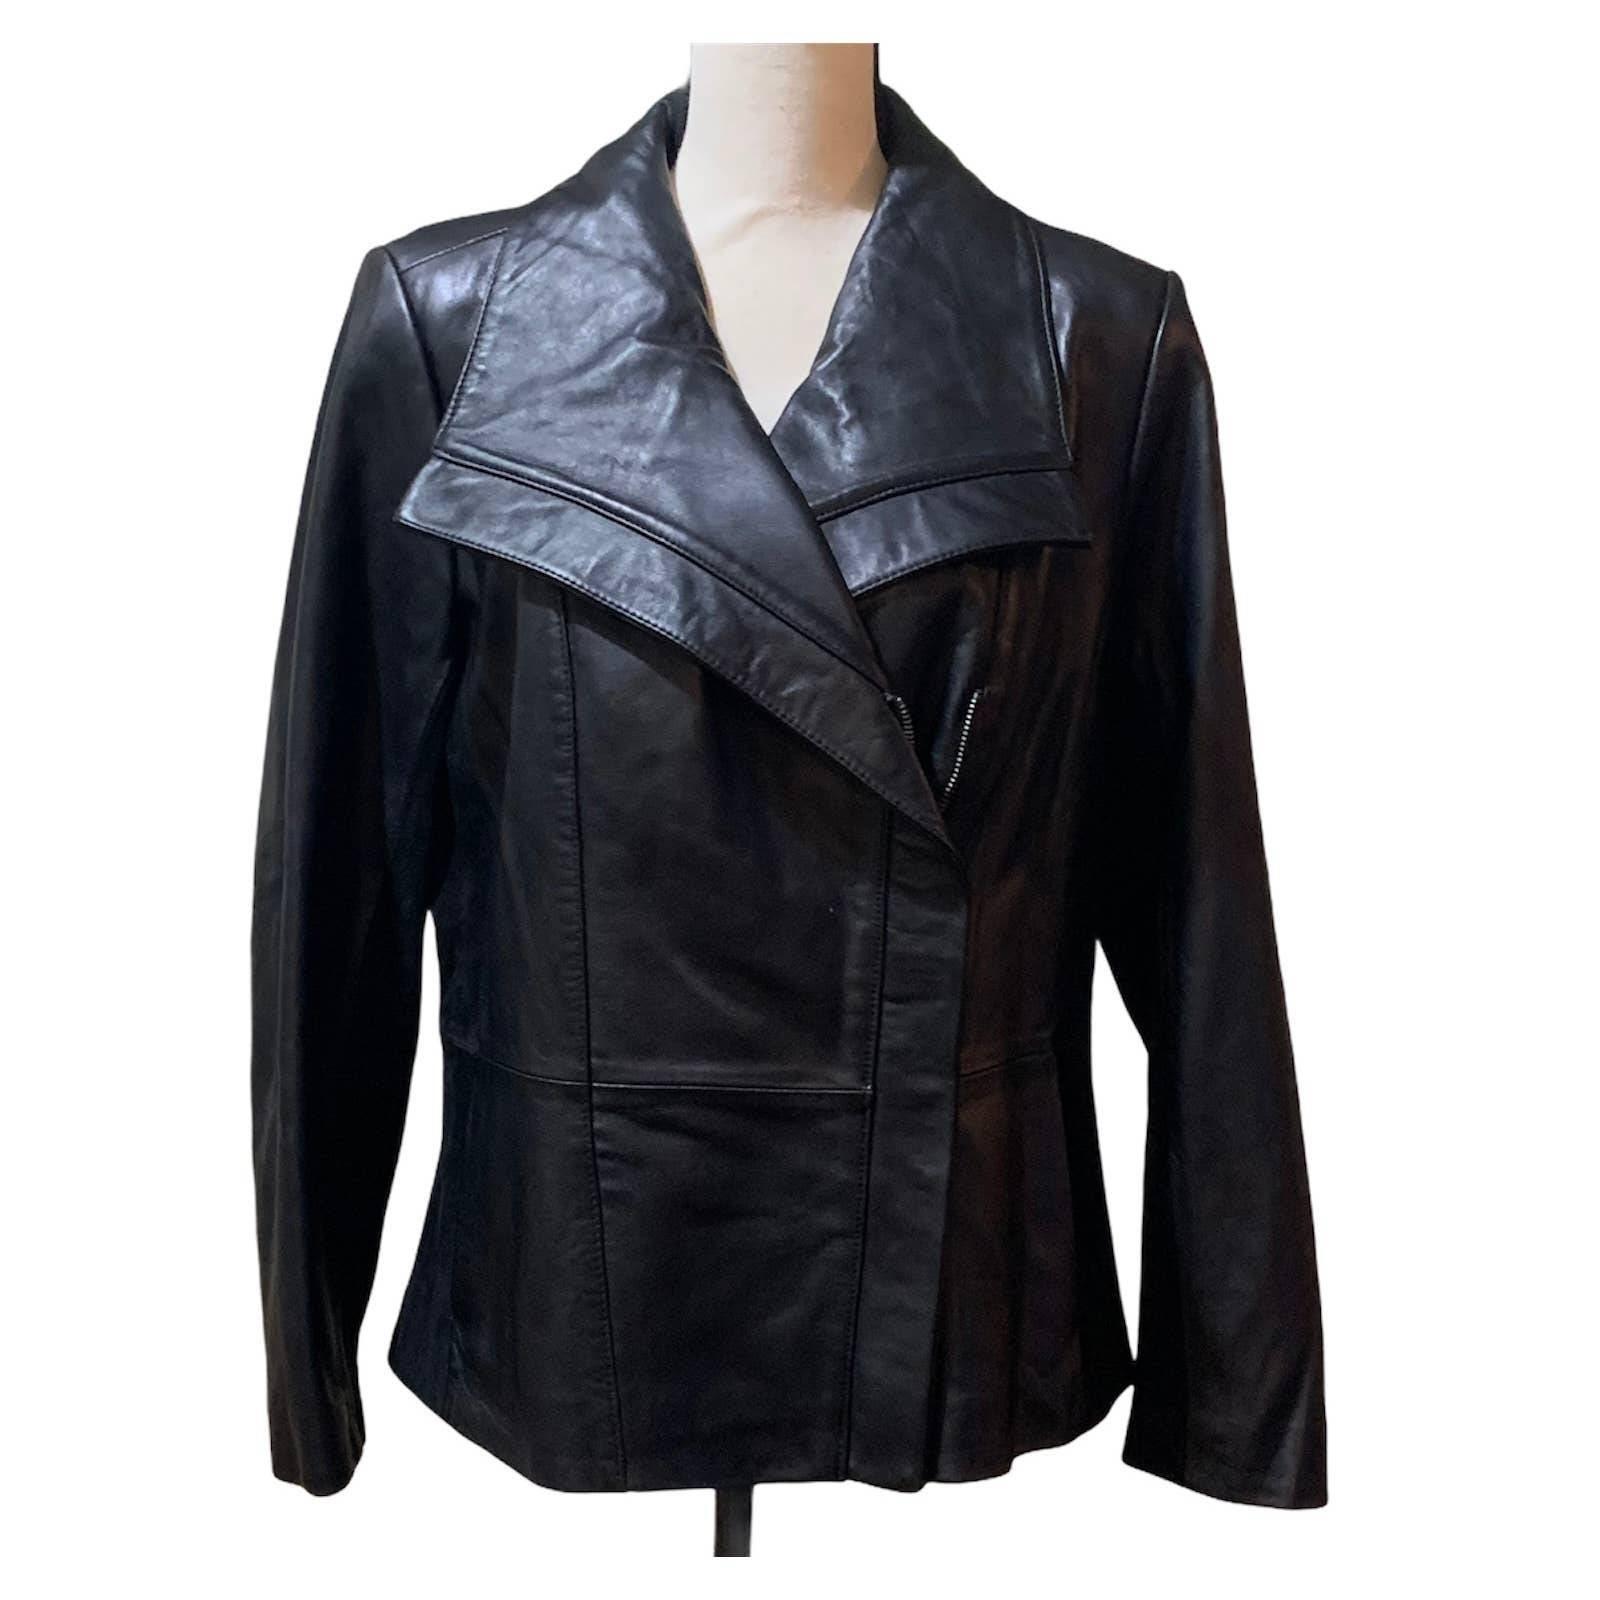 Halston Black Leather Motorcycle Jacket